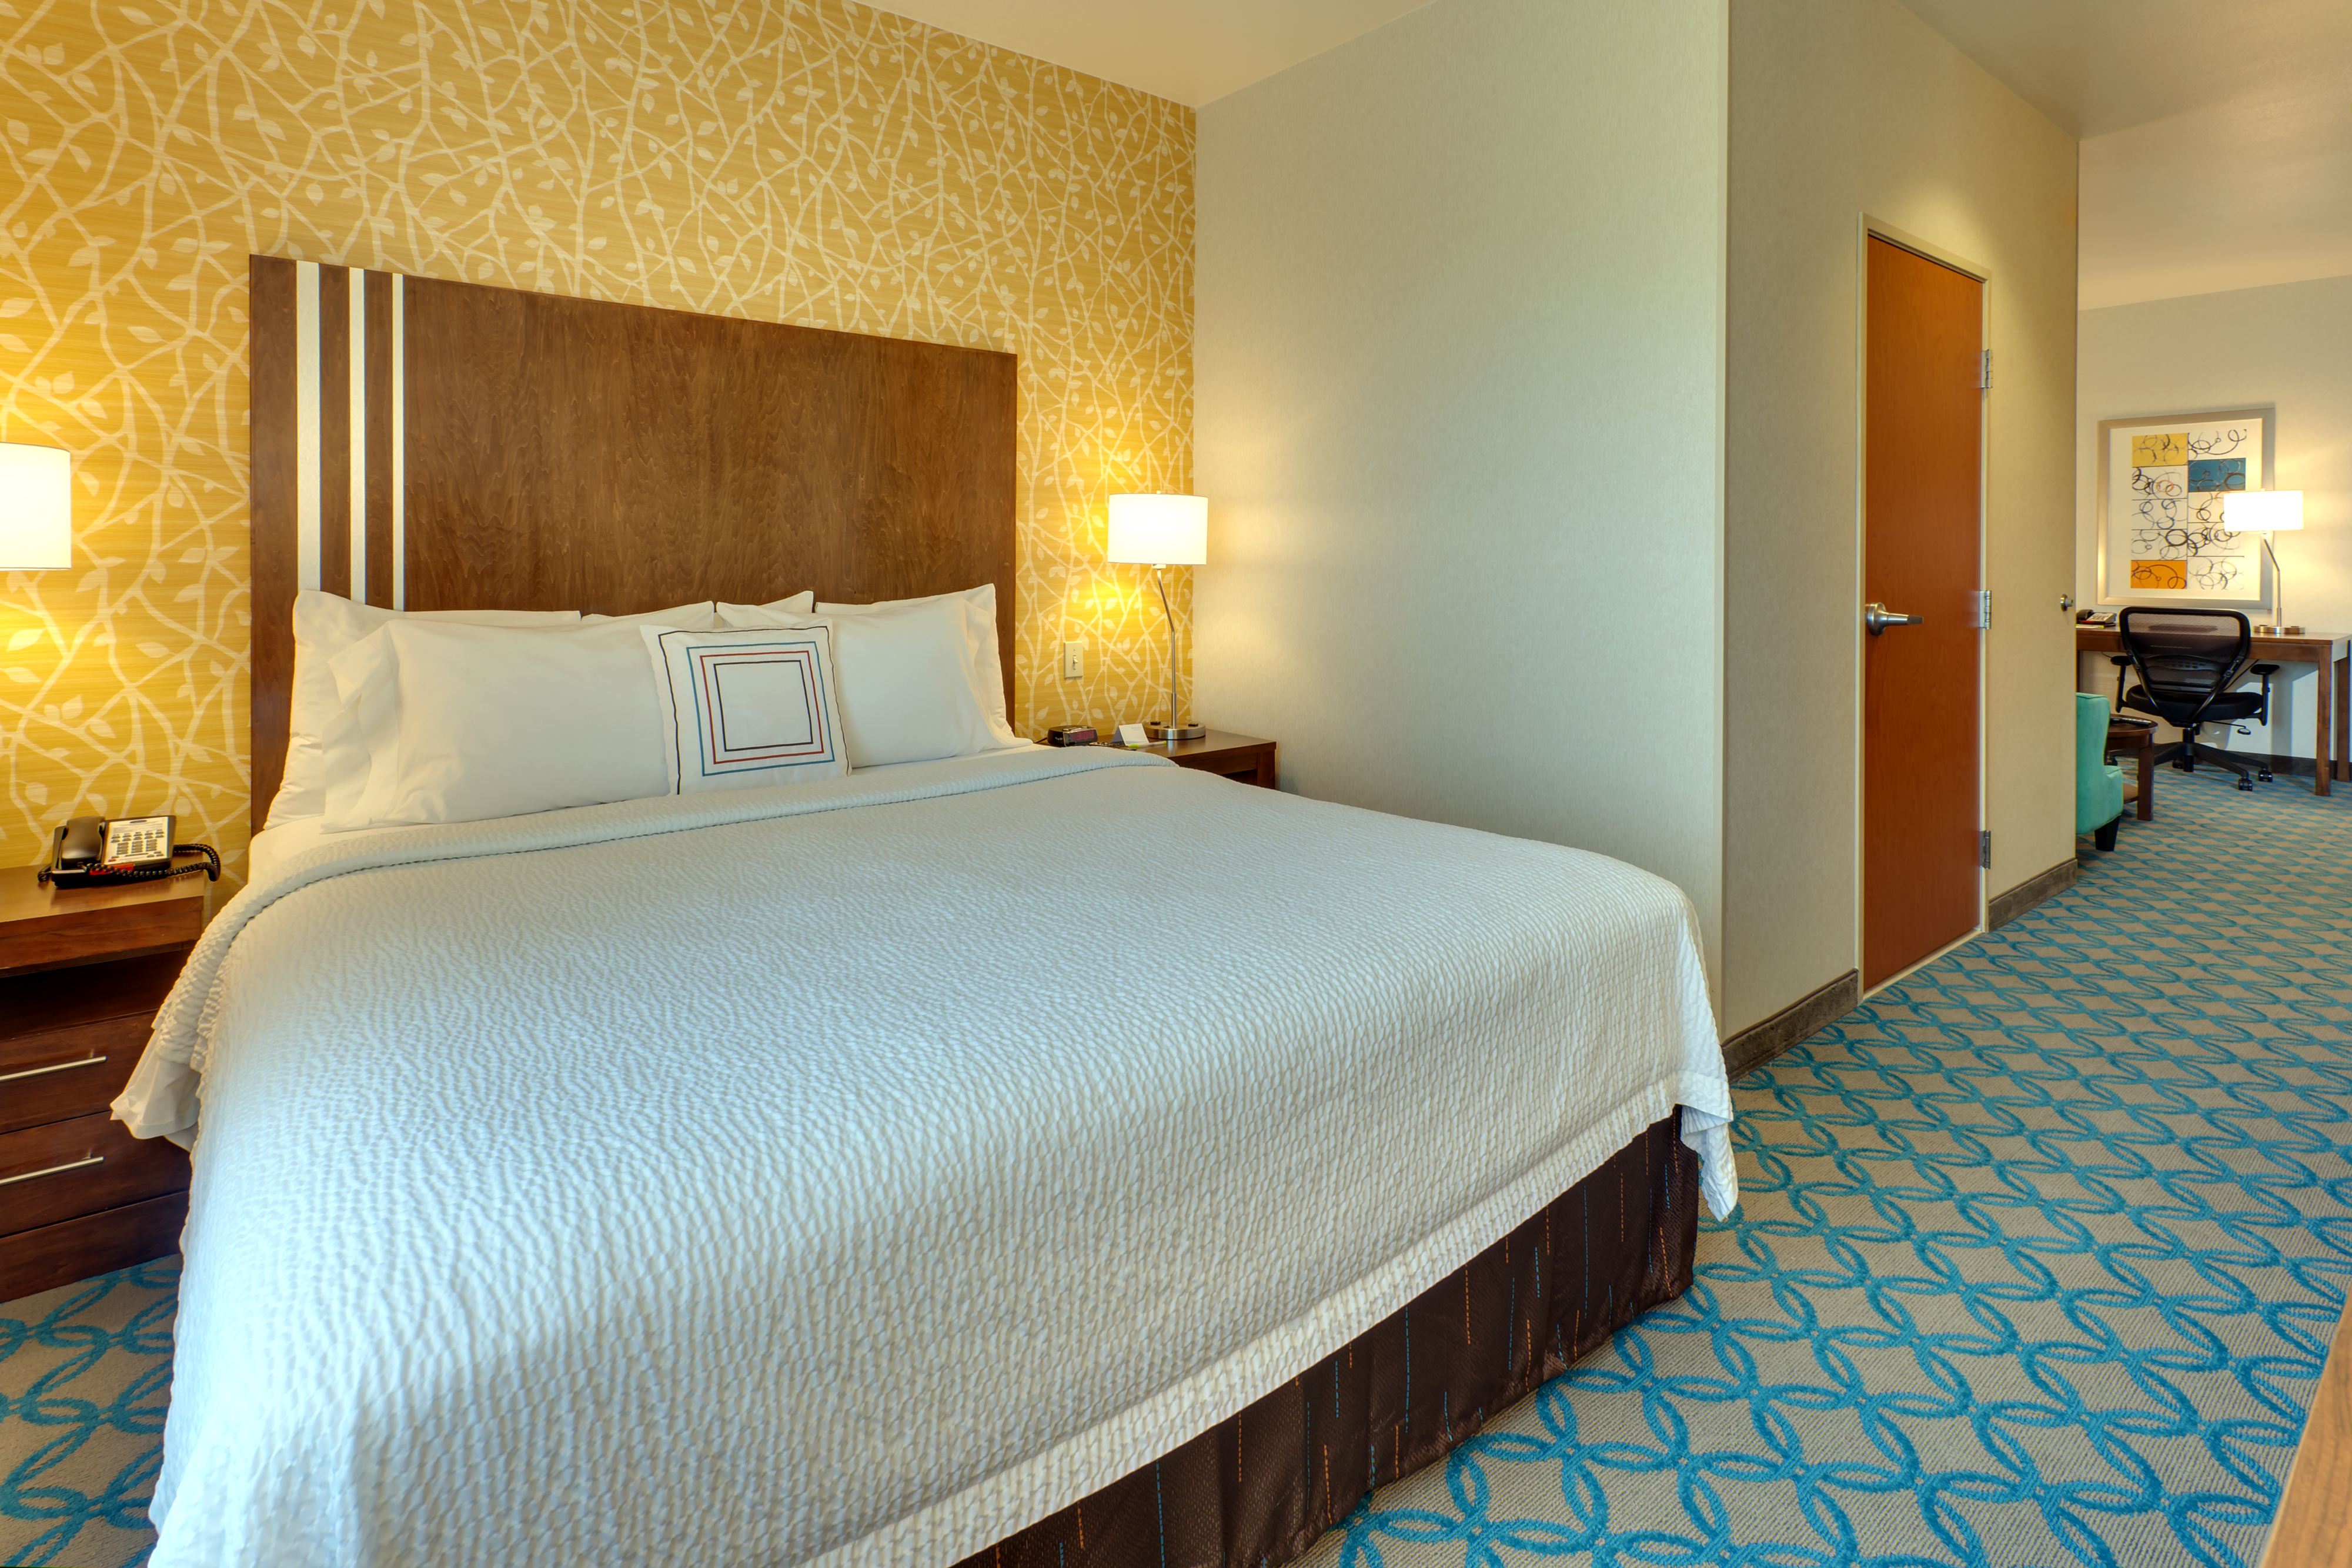 https://www.hotelsbyday.com/_data/default-hotel_image/1/6273/sfome-standard-room-king-sleeping-area.jpg